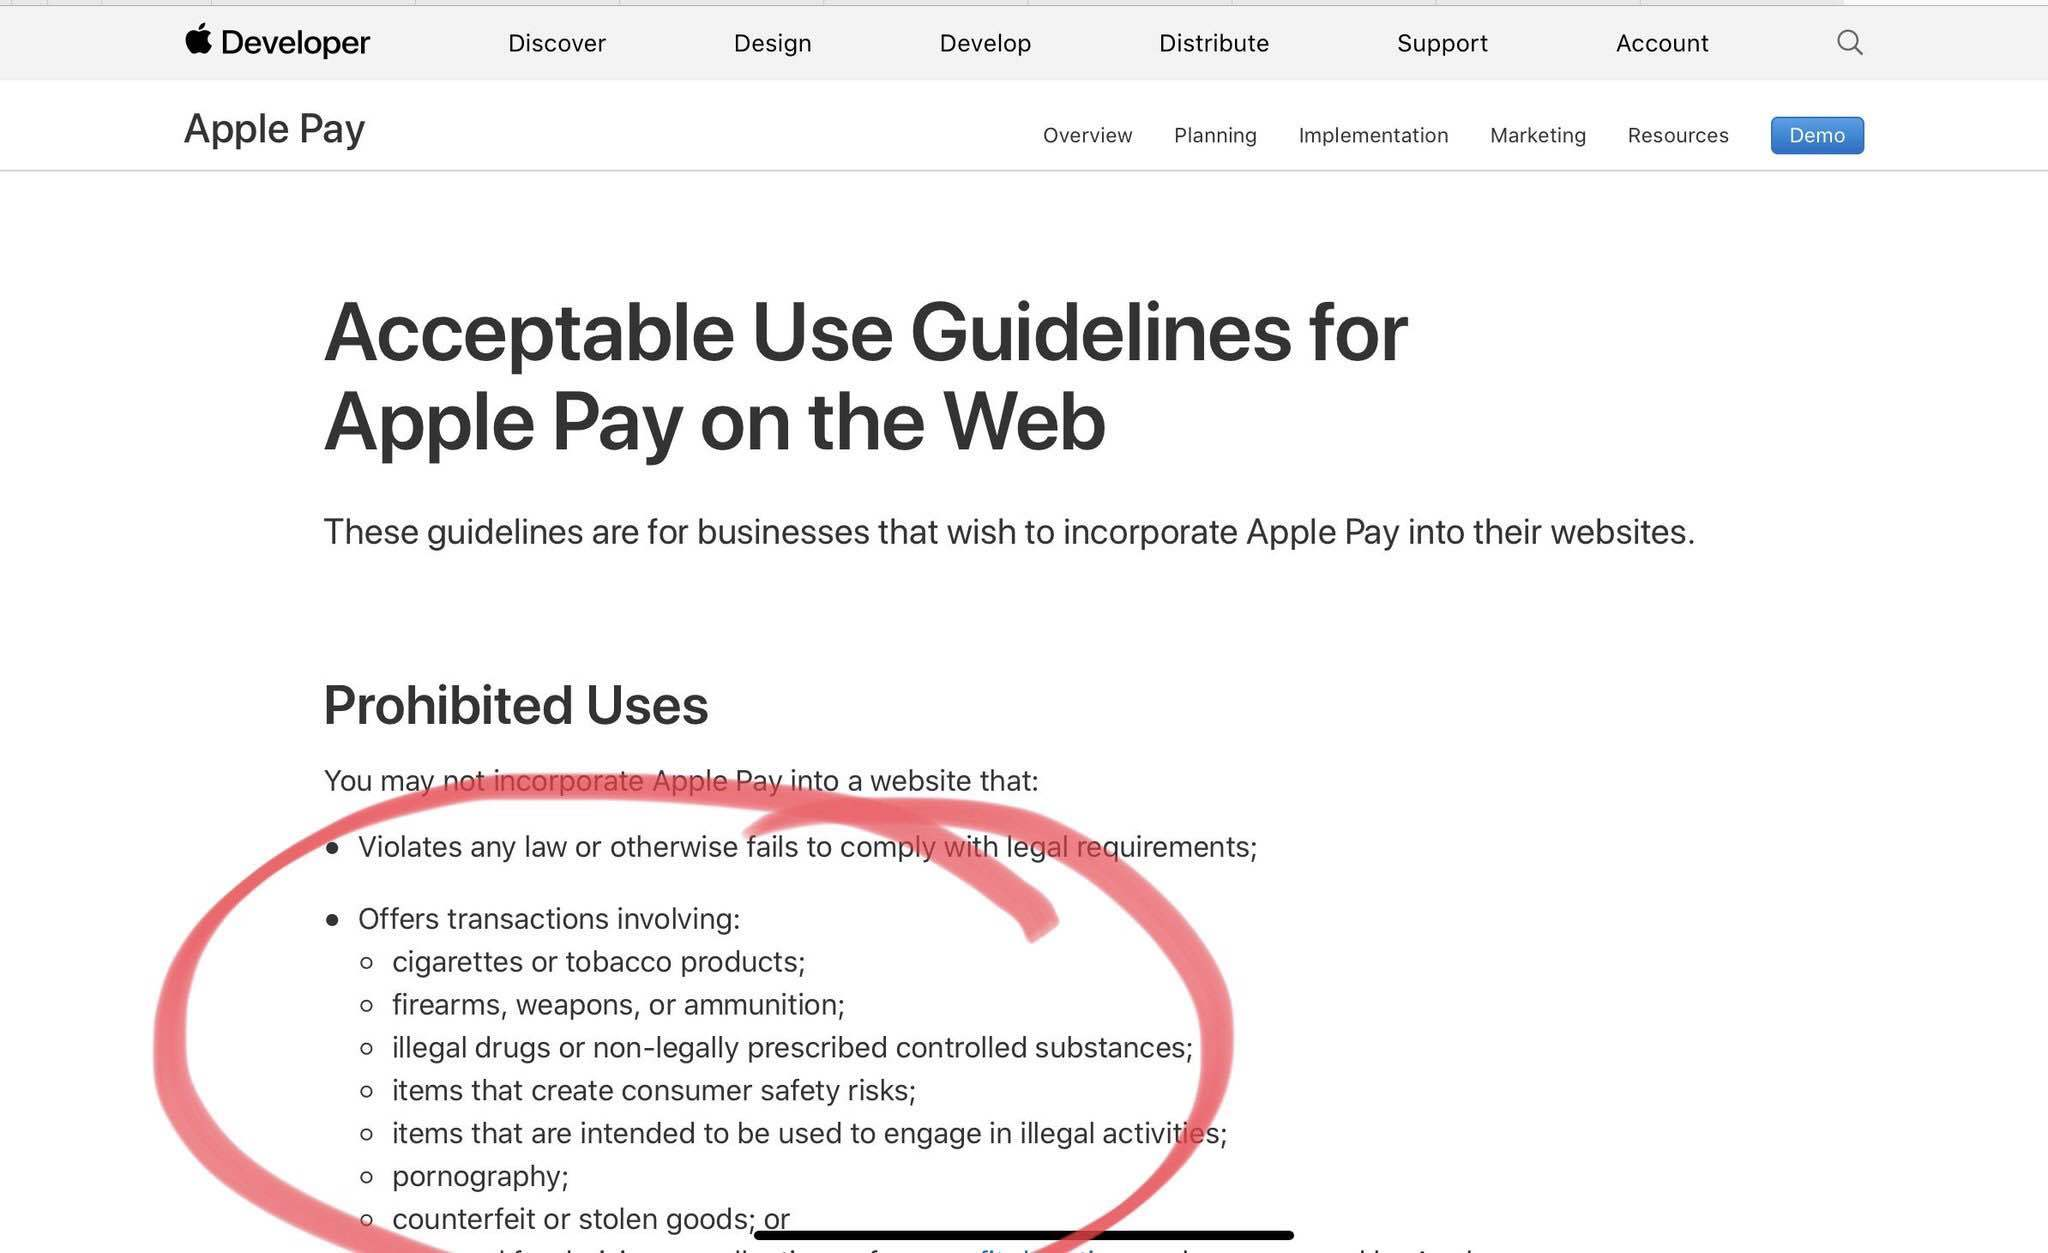 Aws Porn money: wtf apply - no juul, porn on apple pay - blind